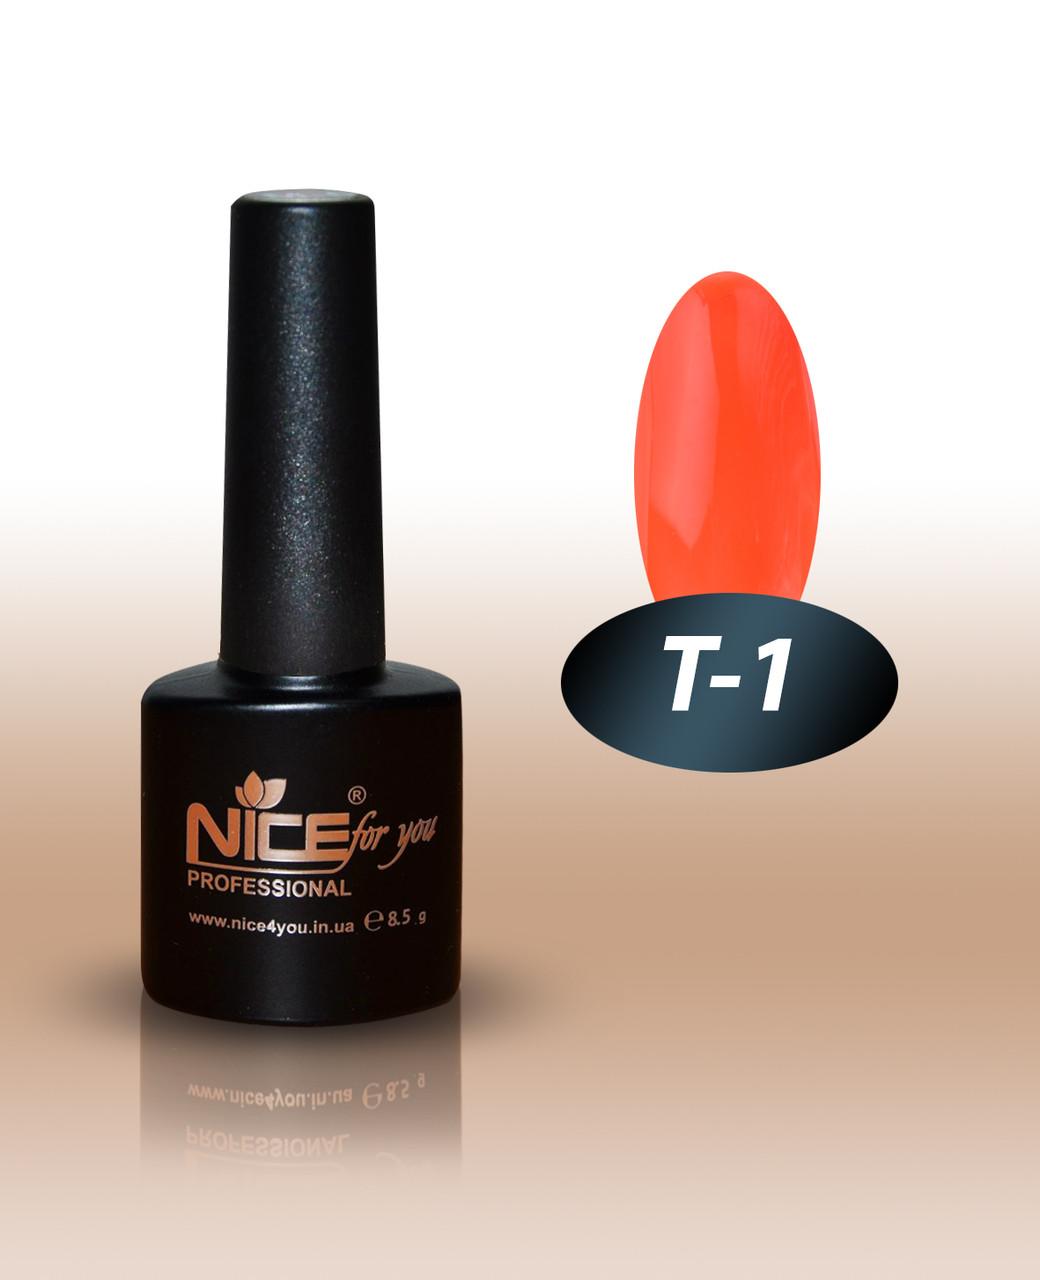 Гель-лаки для ногтей Thermo Nice For You, T-1 , 8,5 мл